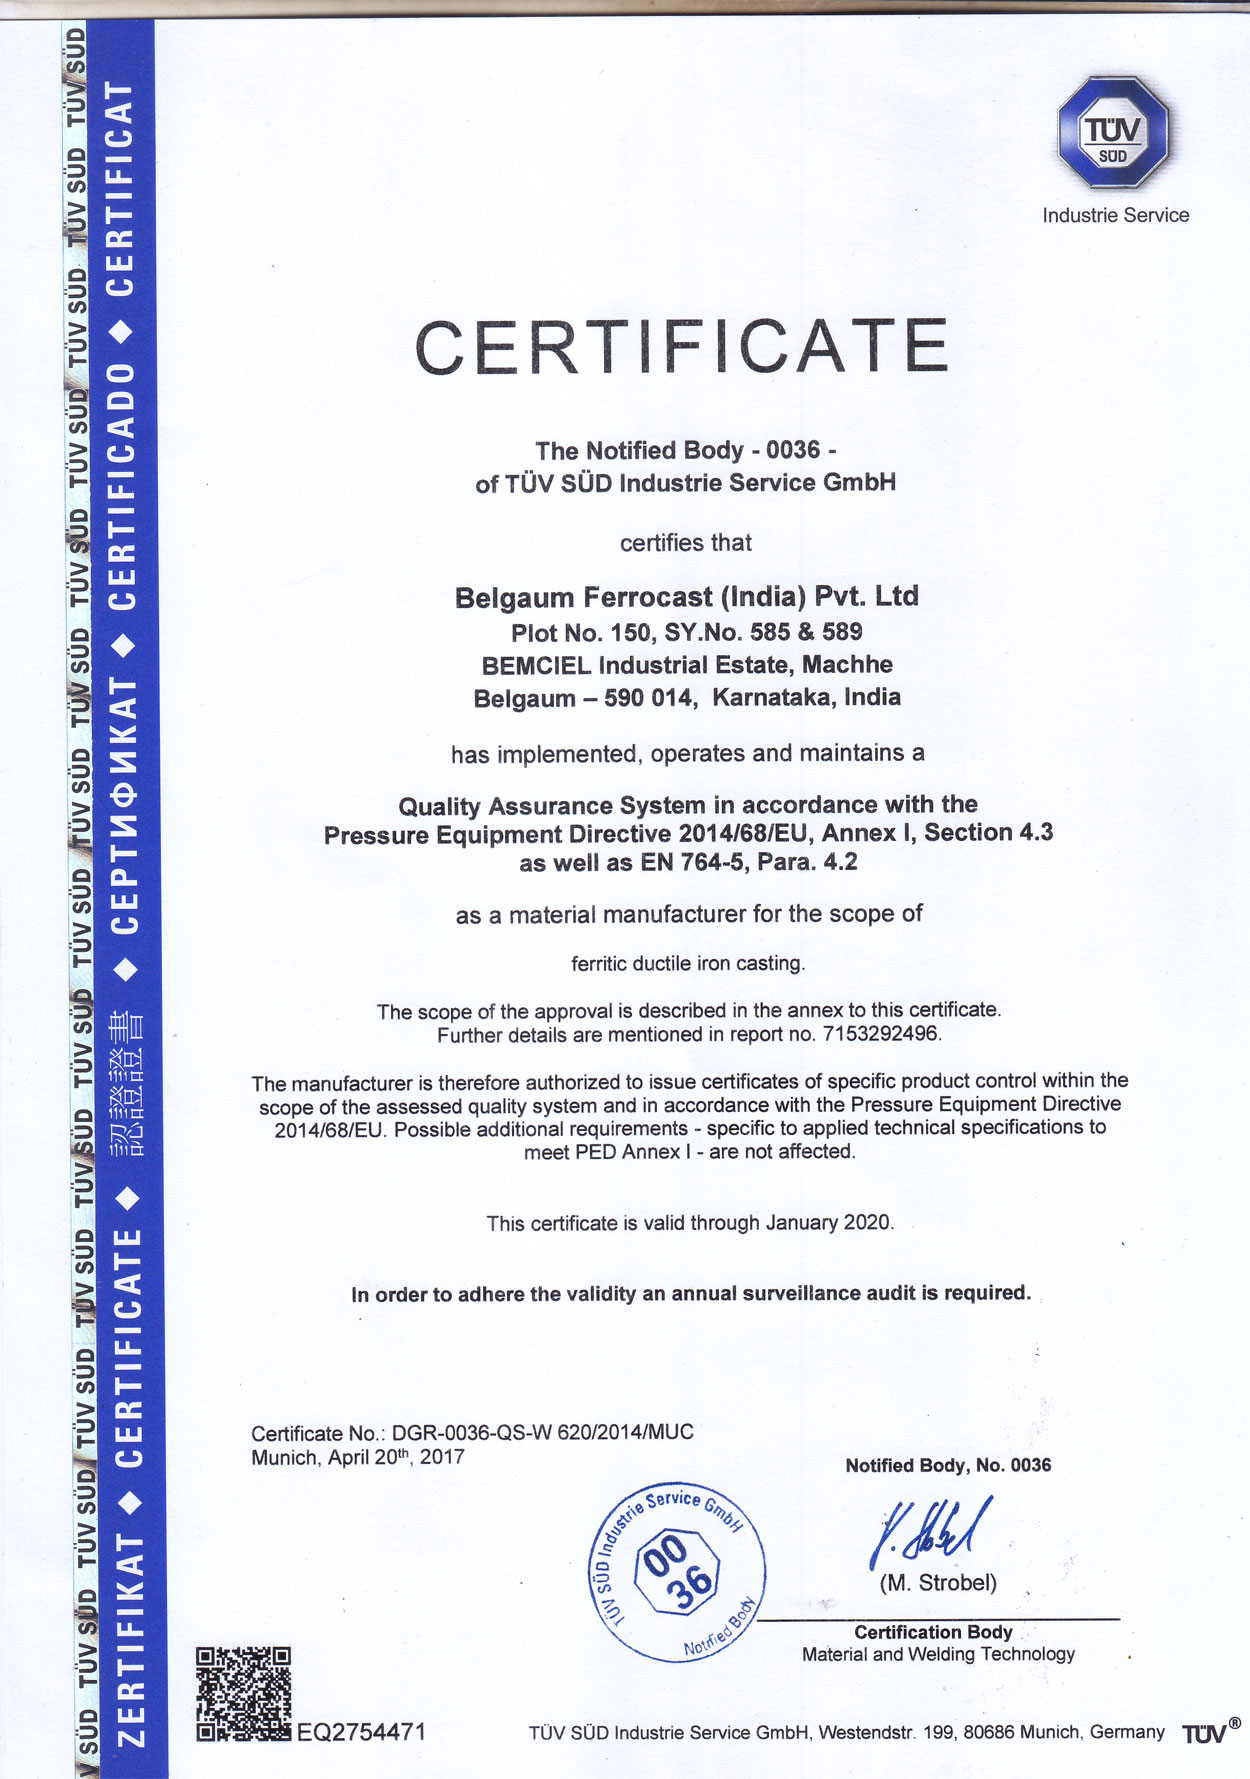 certificate certificates ems qms